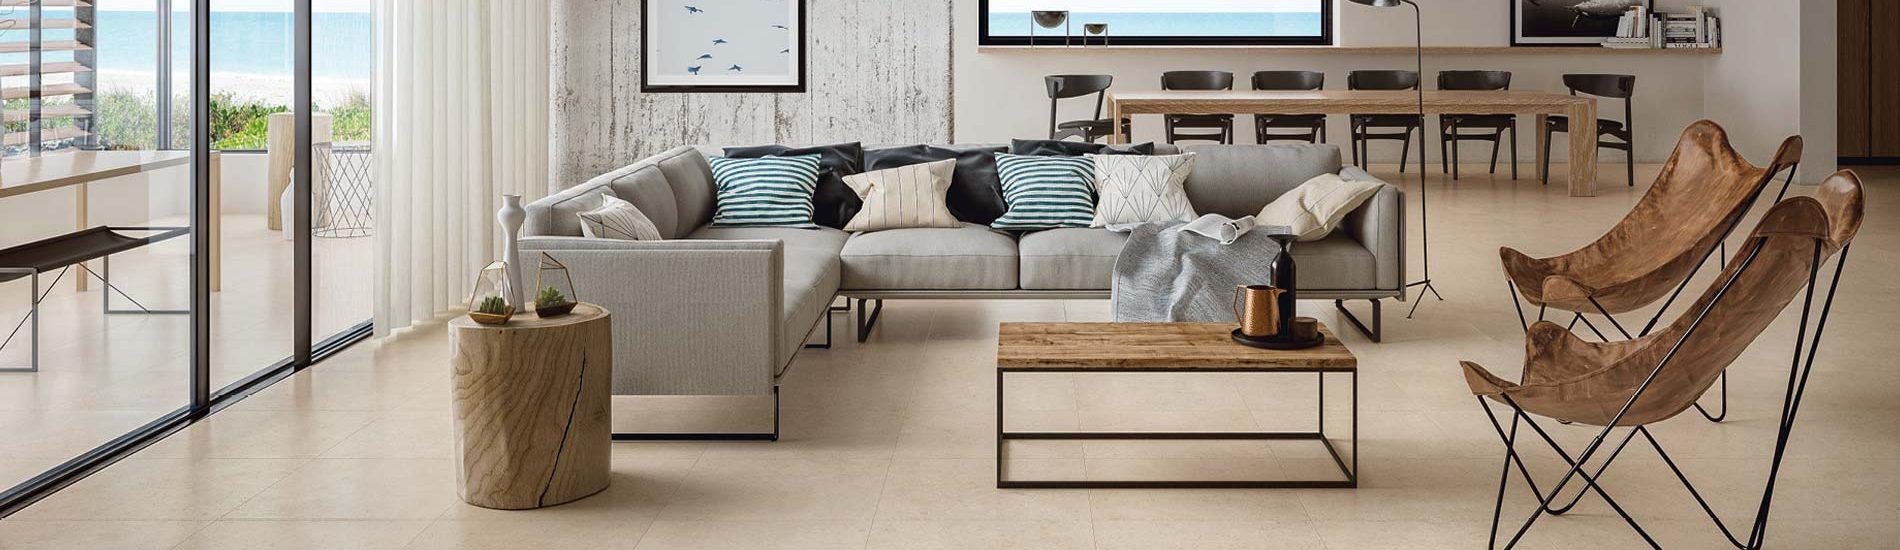 banner-key-concrete-look-floor-wall-tile-unicom-starker